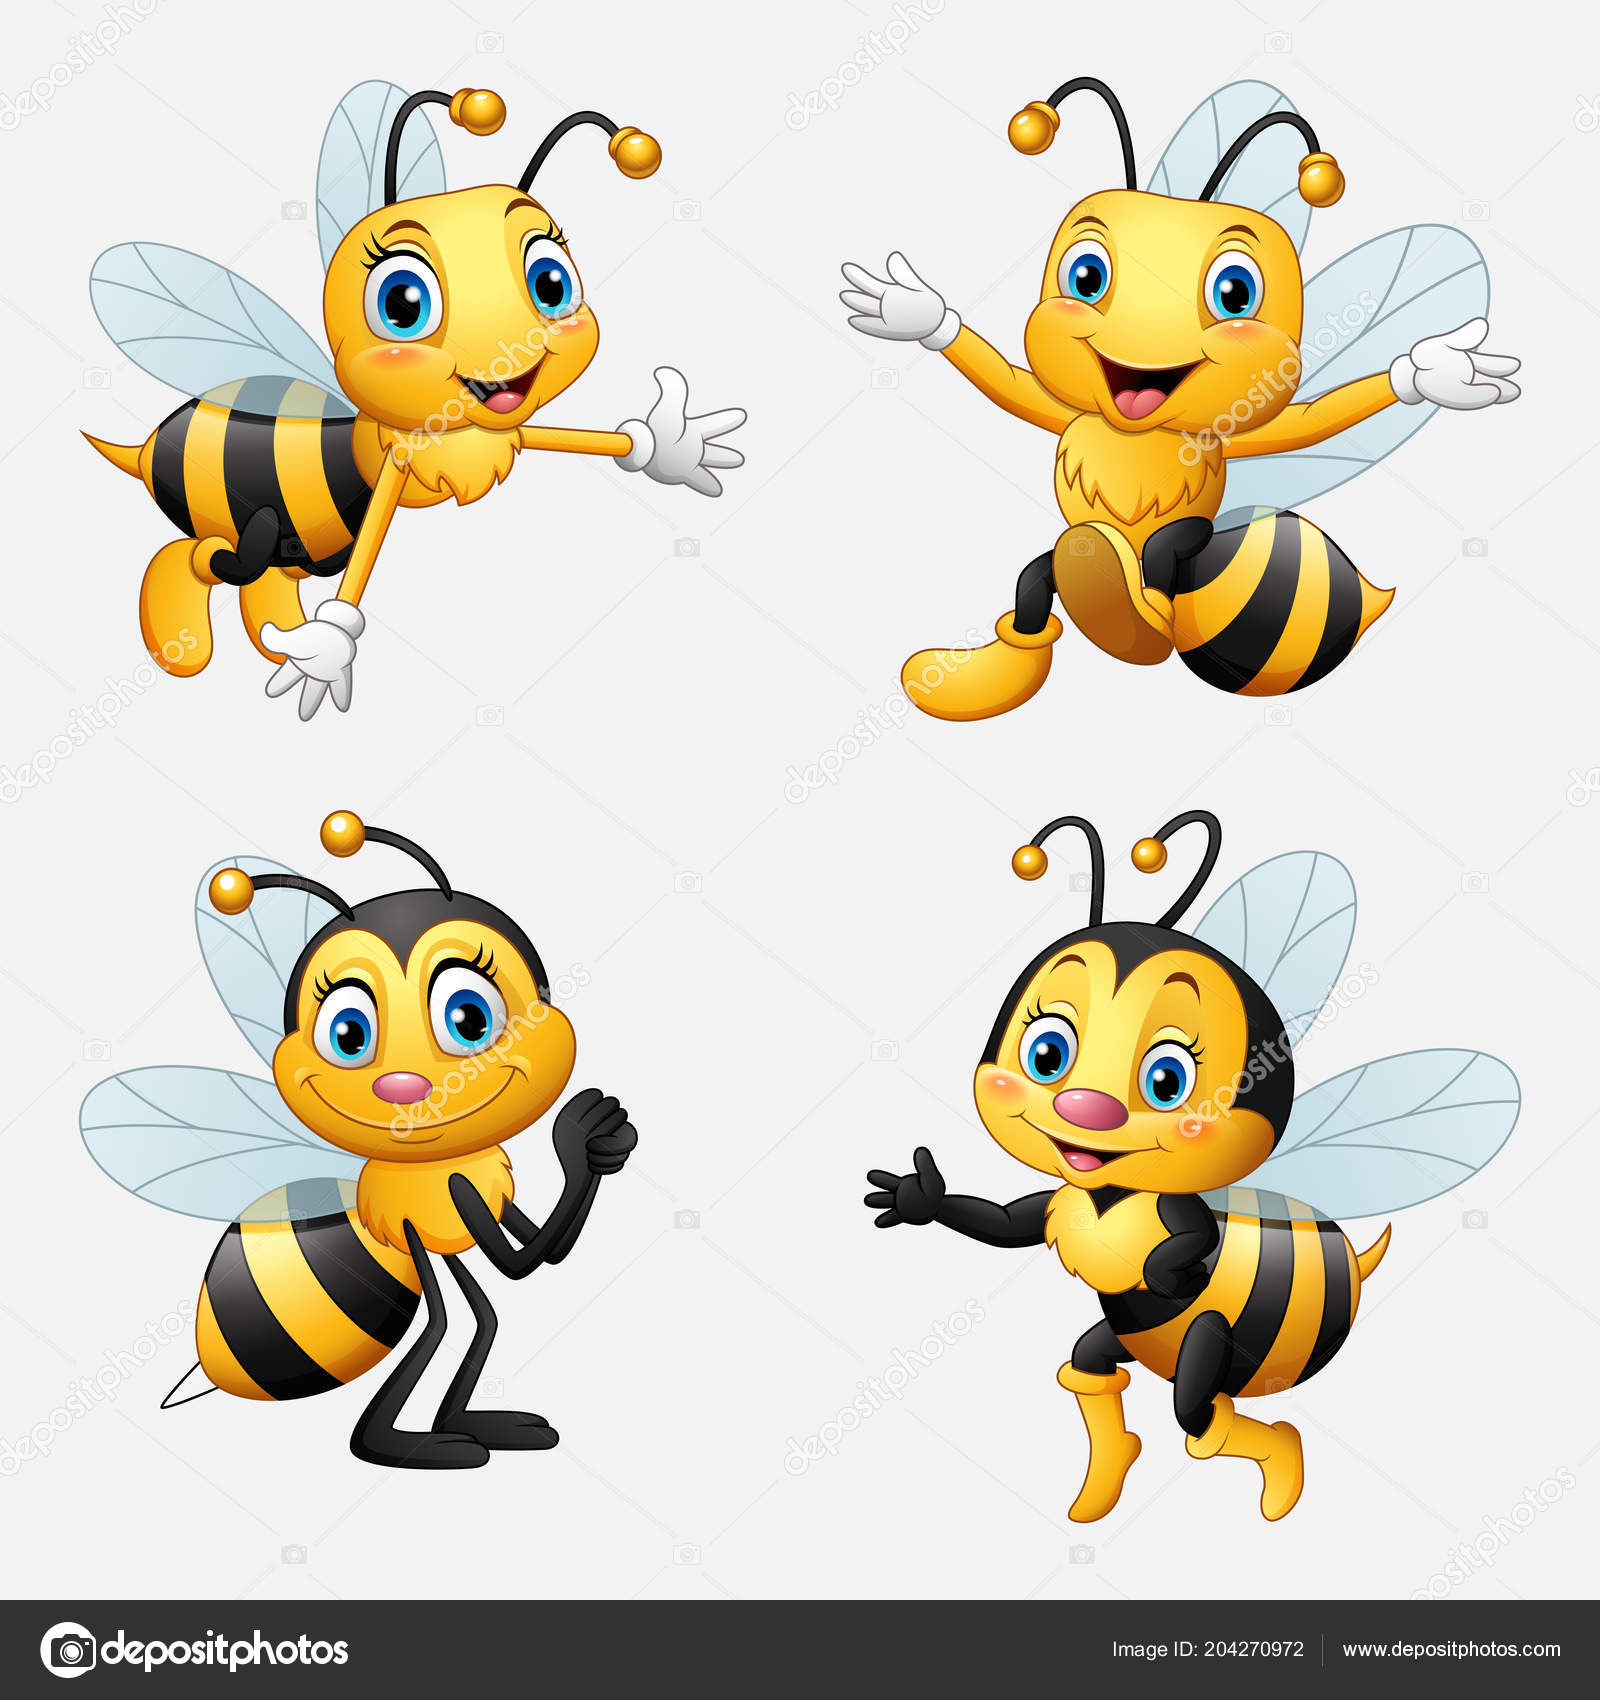 Funny Cartoon Bee Collection Stock Vector C Dreamcreation01